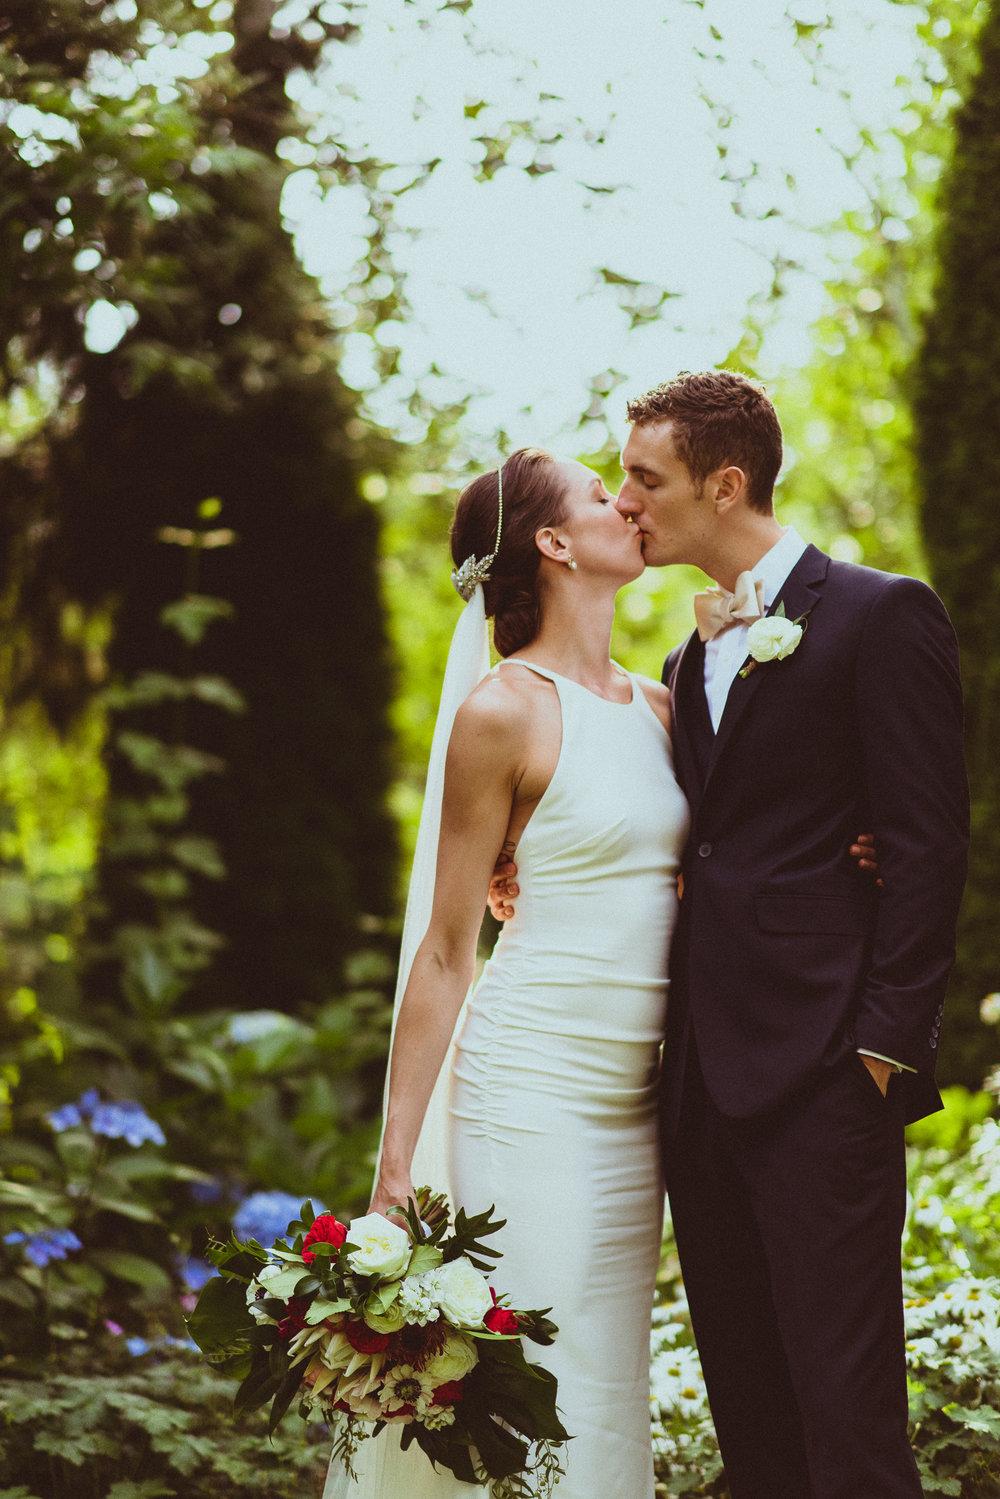 BEST_CHICAG_WEDDING_PHOTOGRAPHER_ZOE_RAIN_-71.jpg